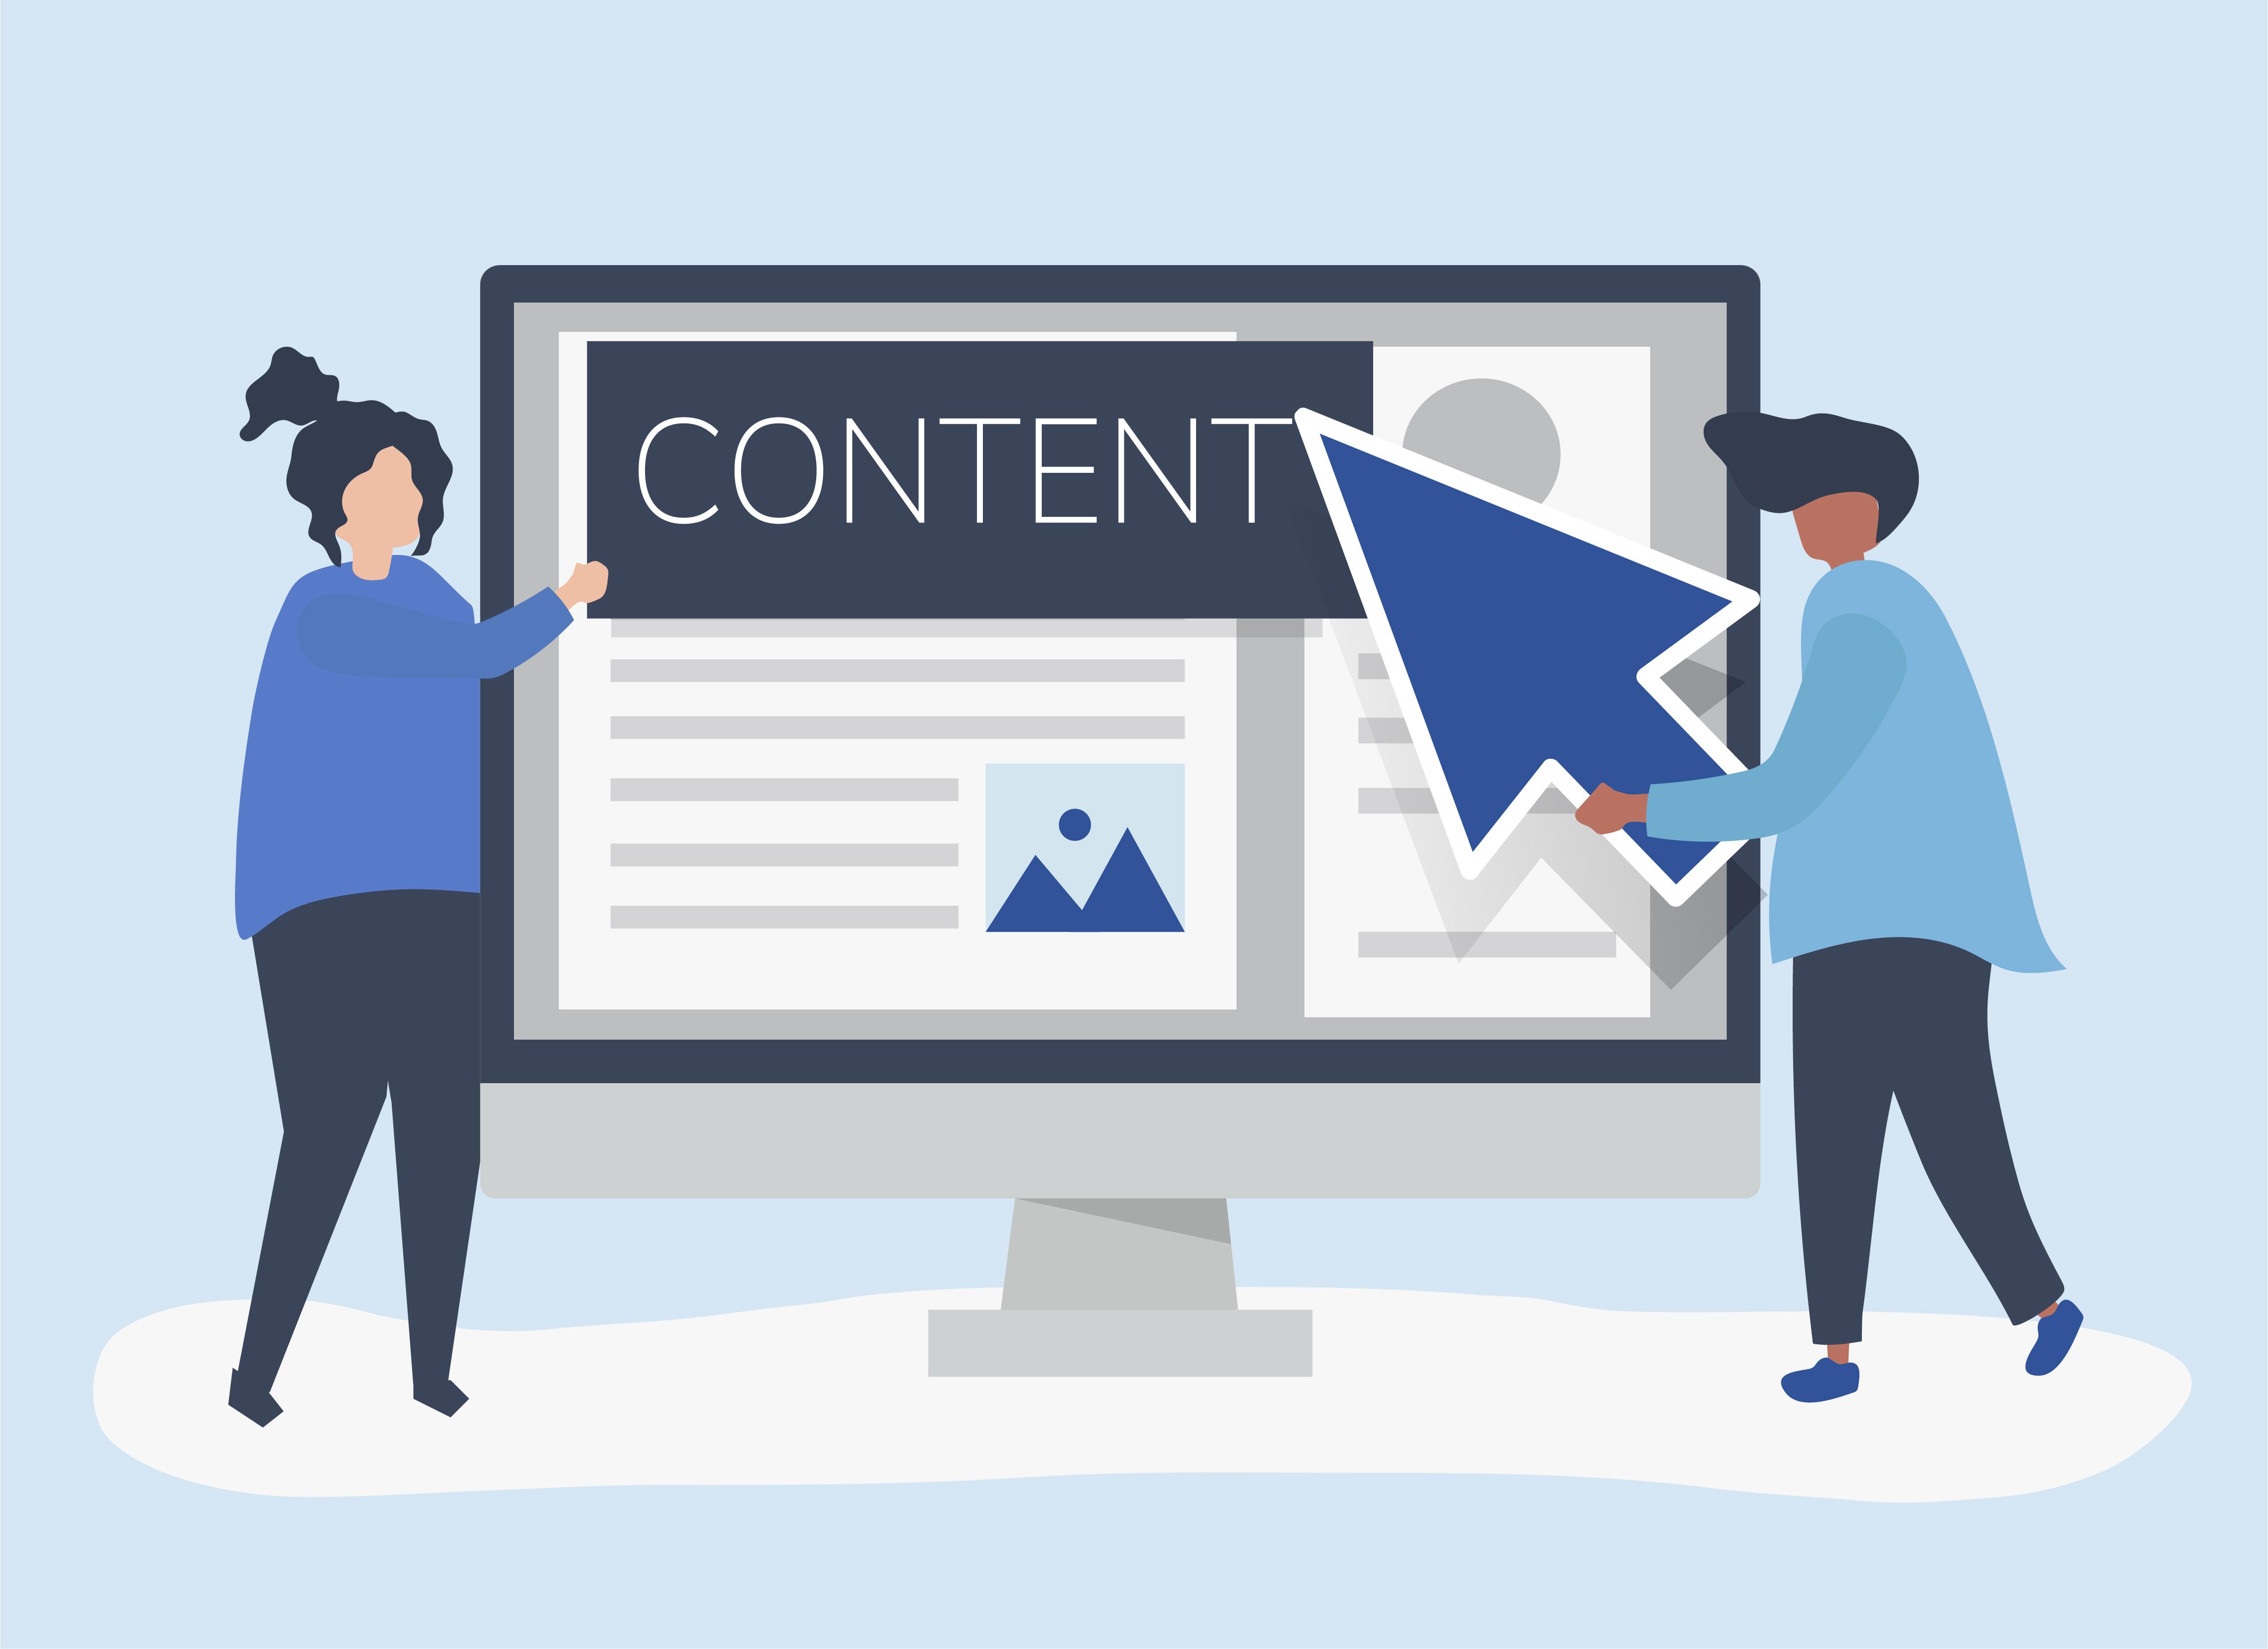 этапы создания сайта контент и контент маркетинг